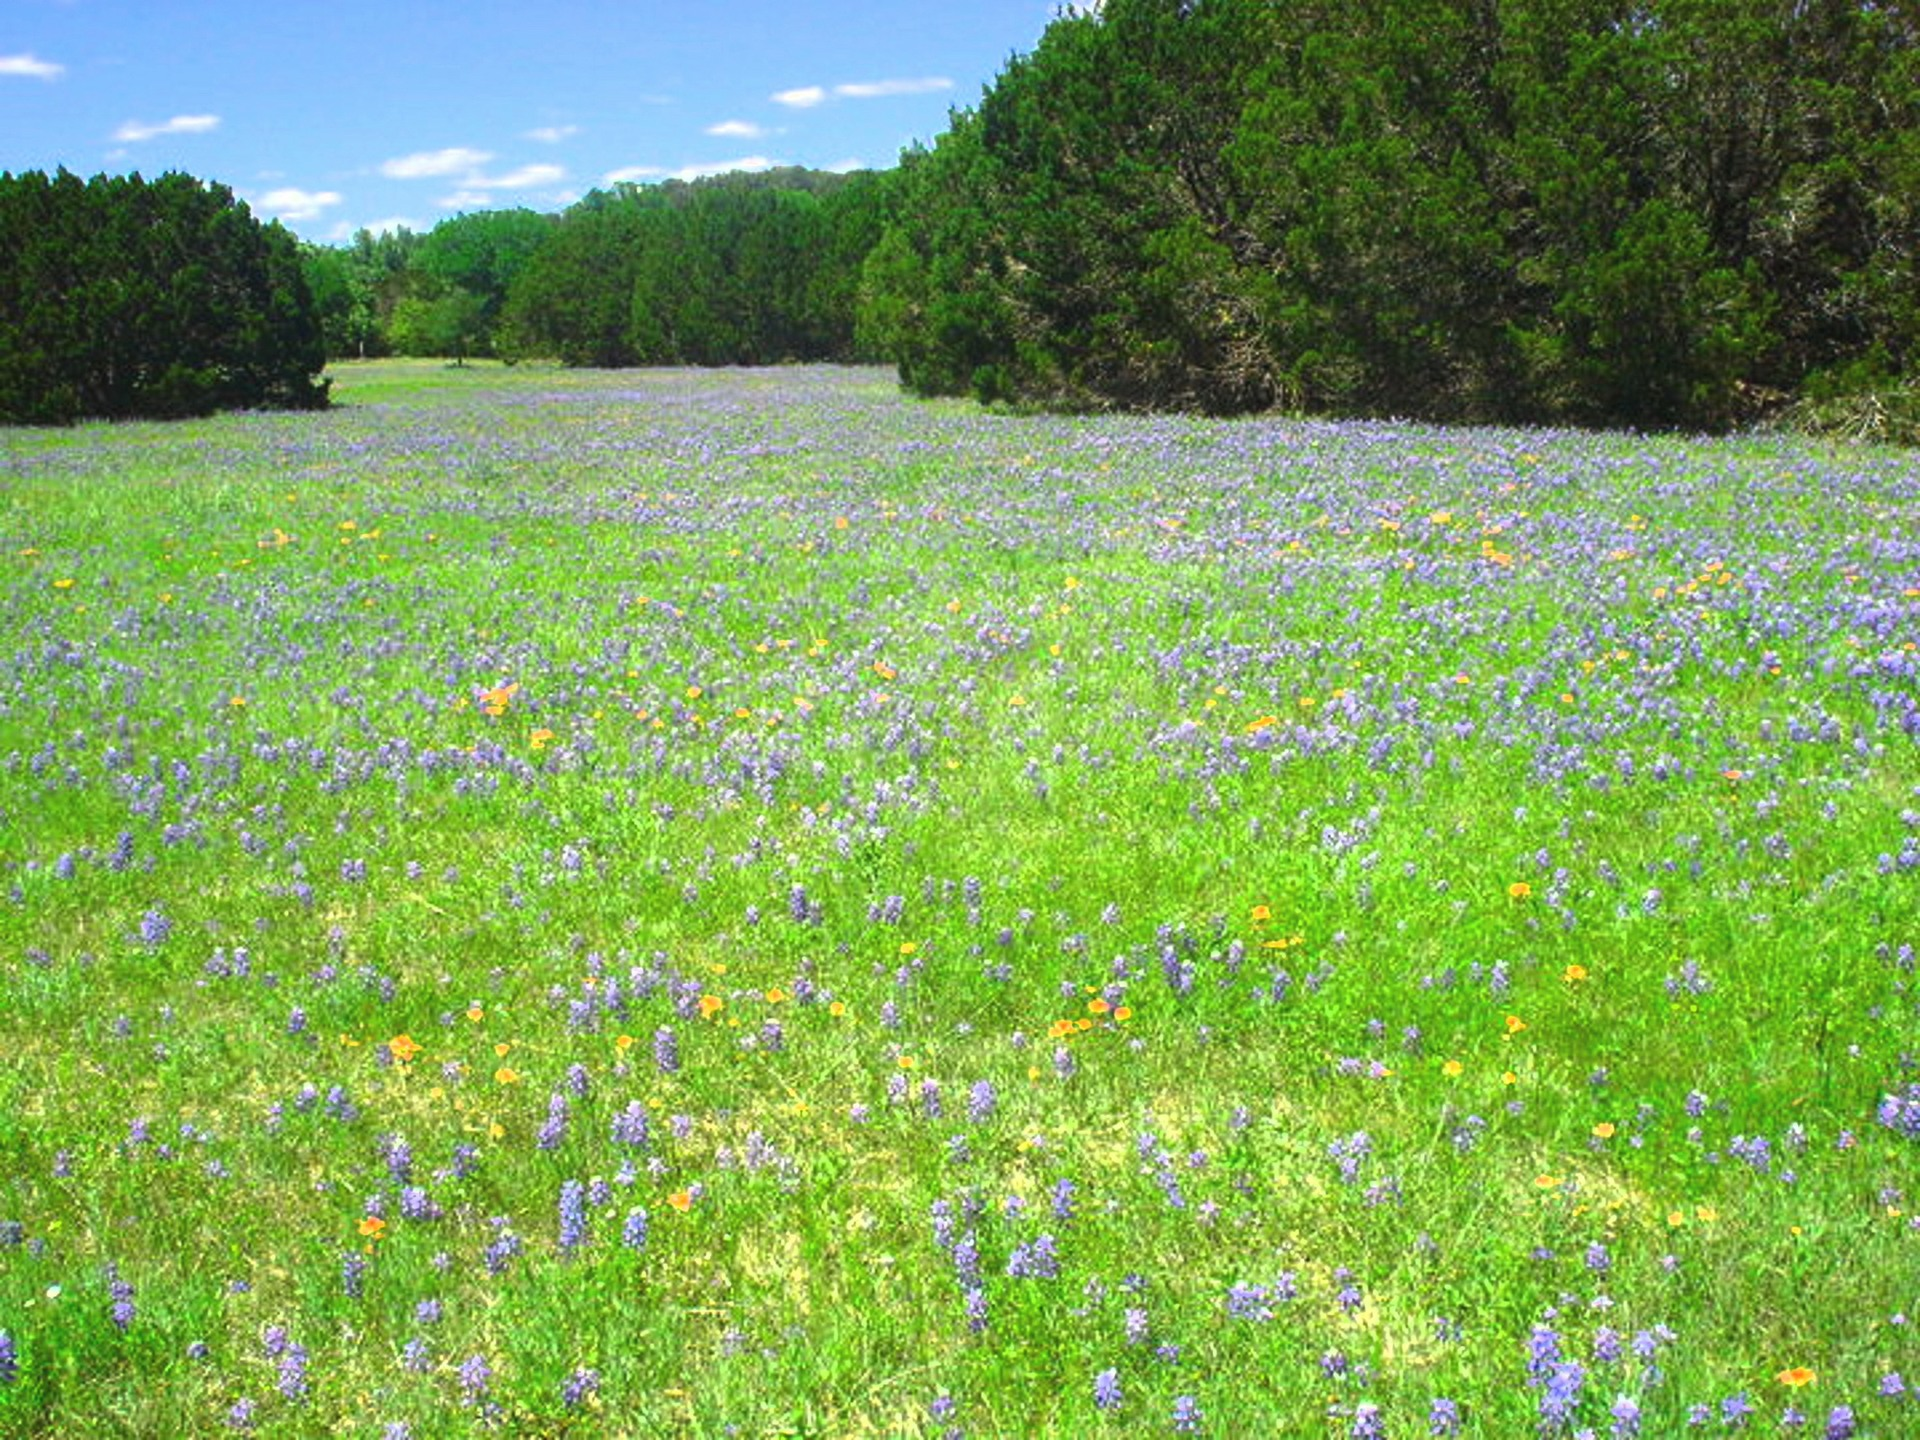 Bluebonnets in Texas | rainesjacque, countryside, field, flower